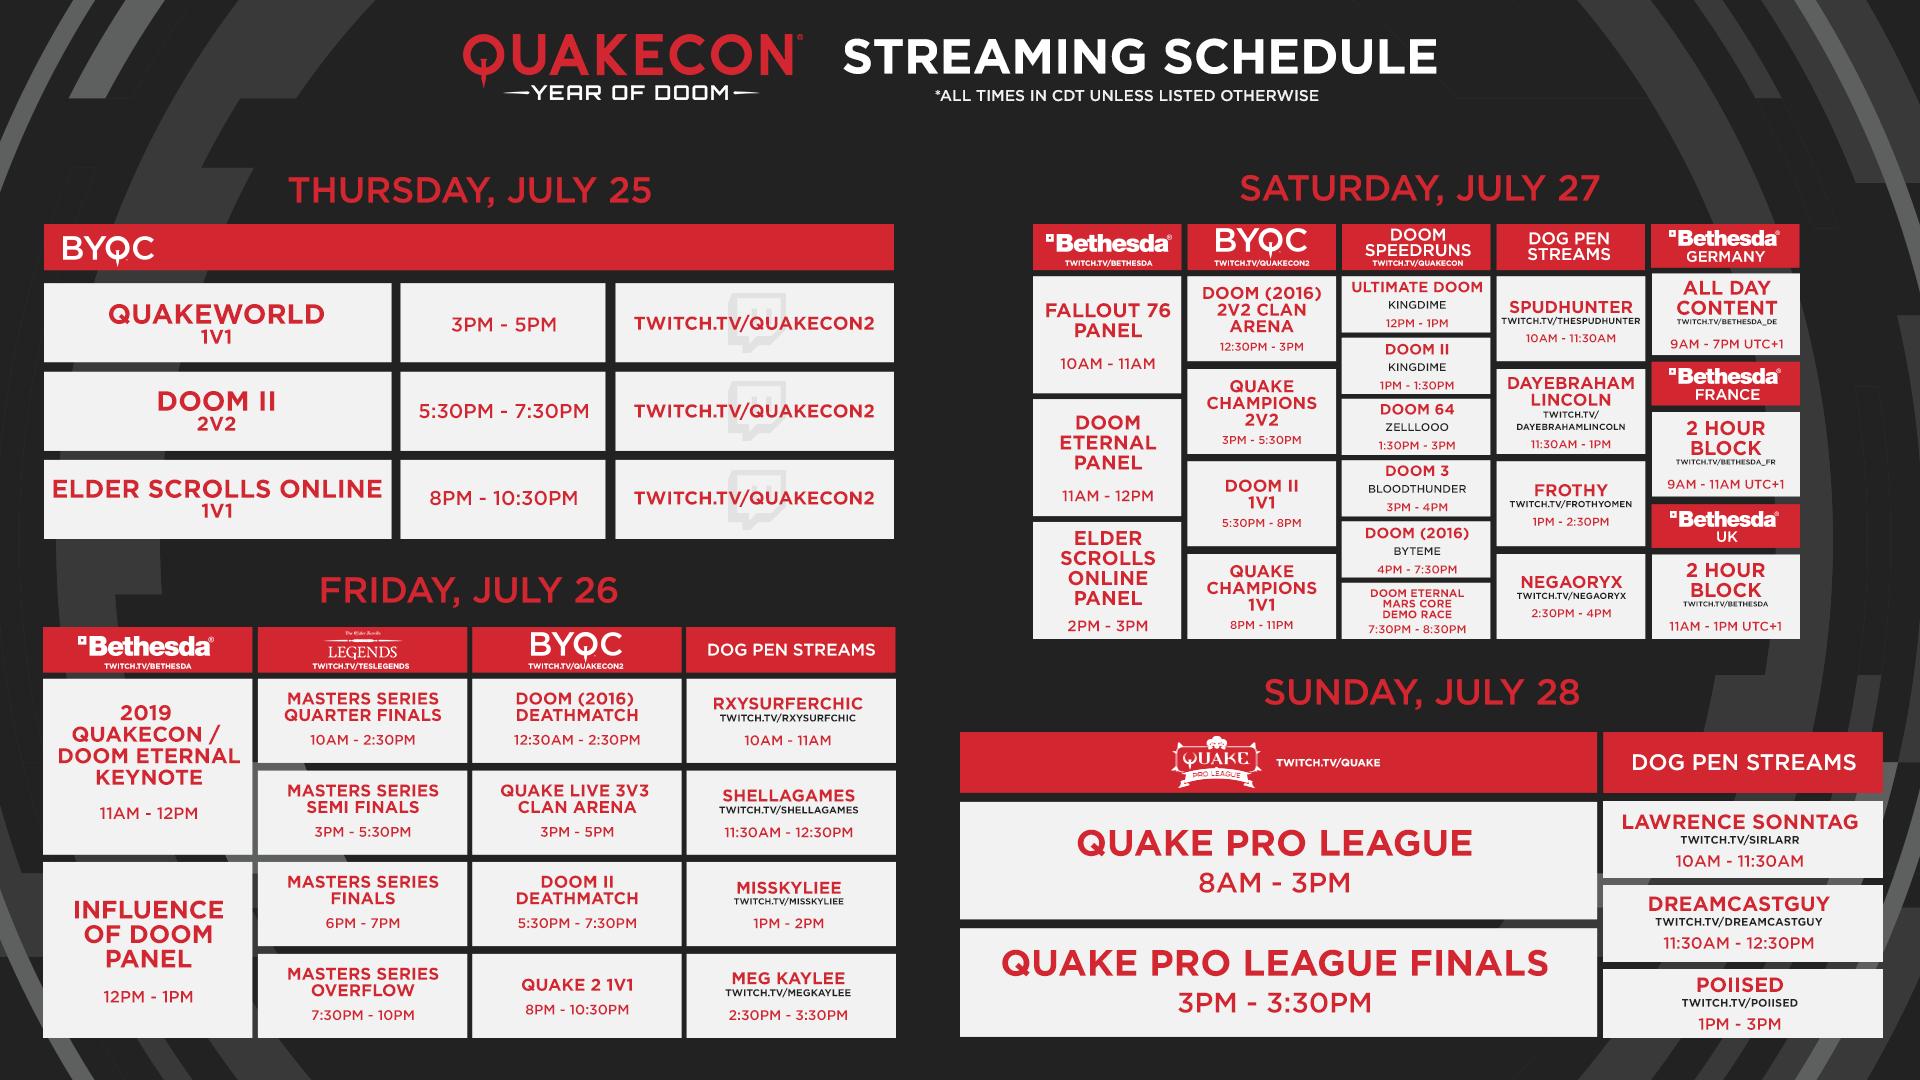 QuakeCon 2019 streaming schedule